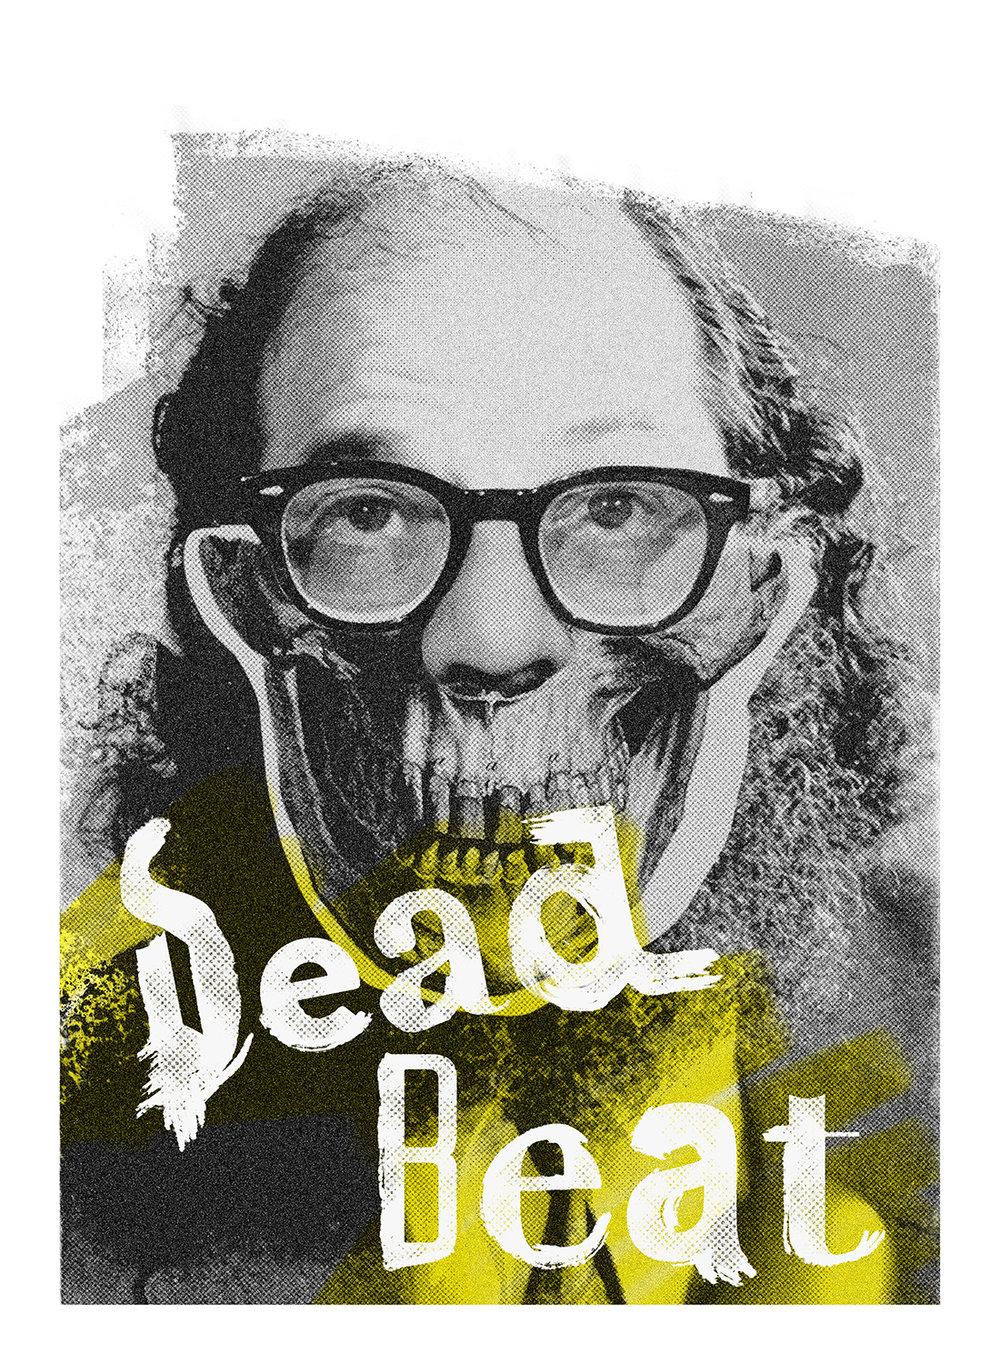 Poster - Dead Beat(nik.jpg